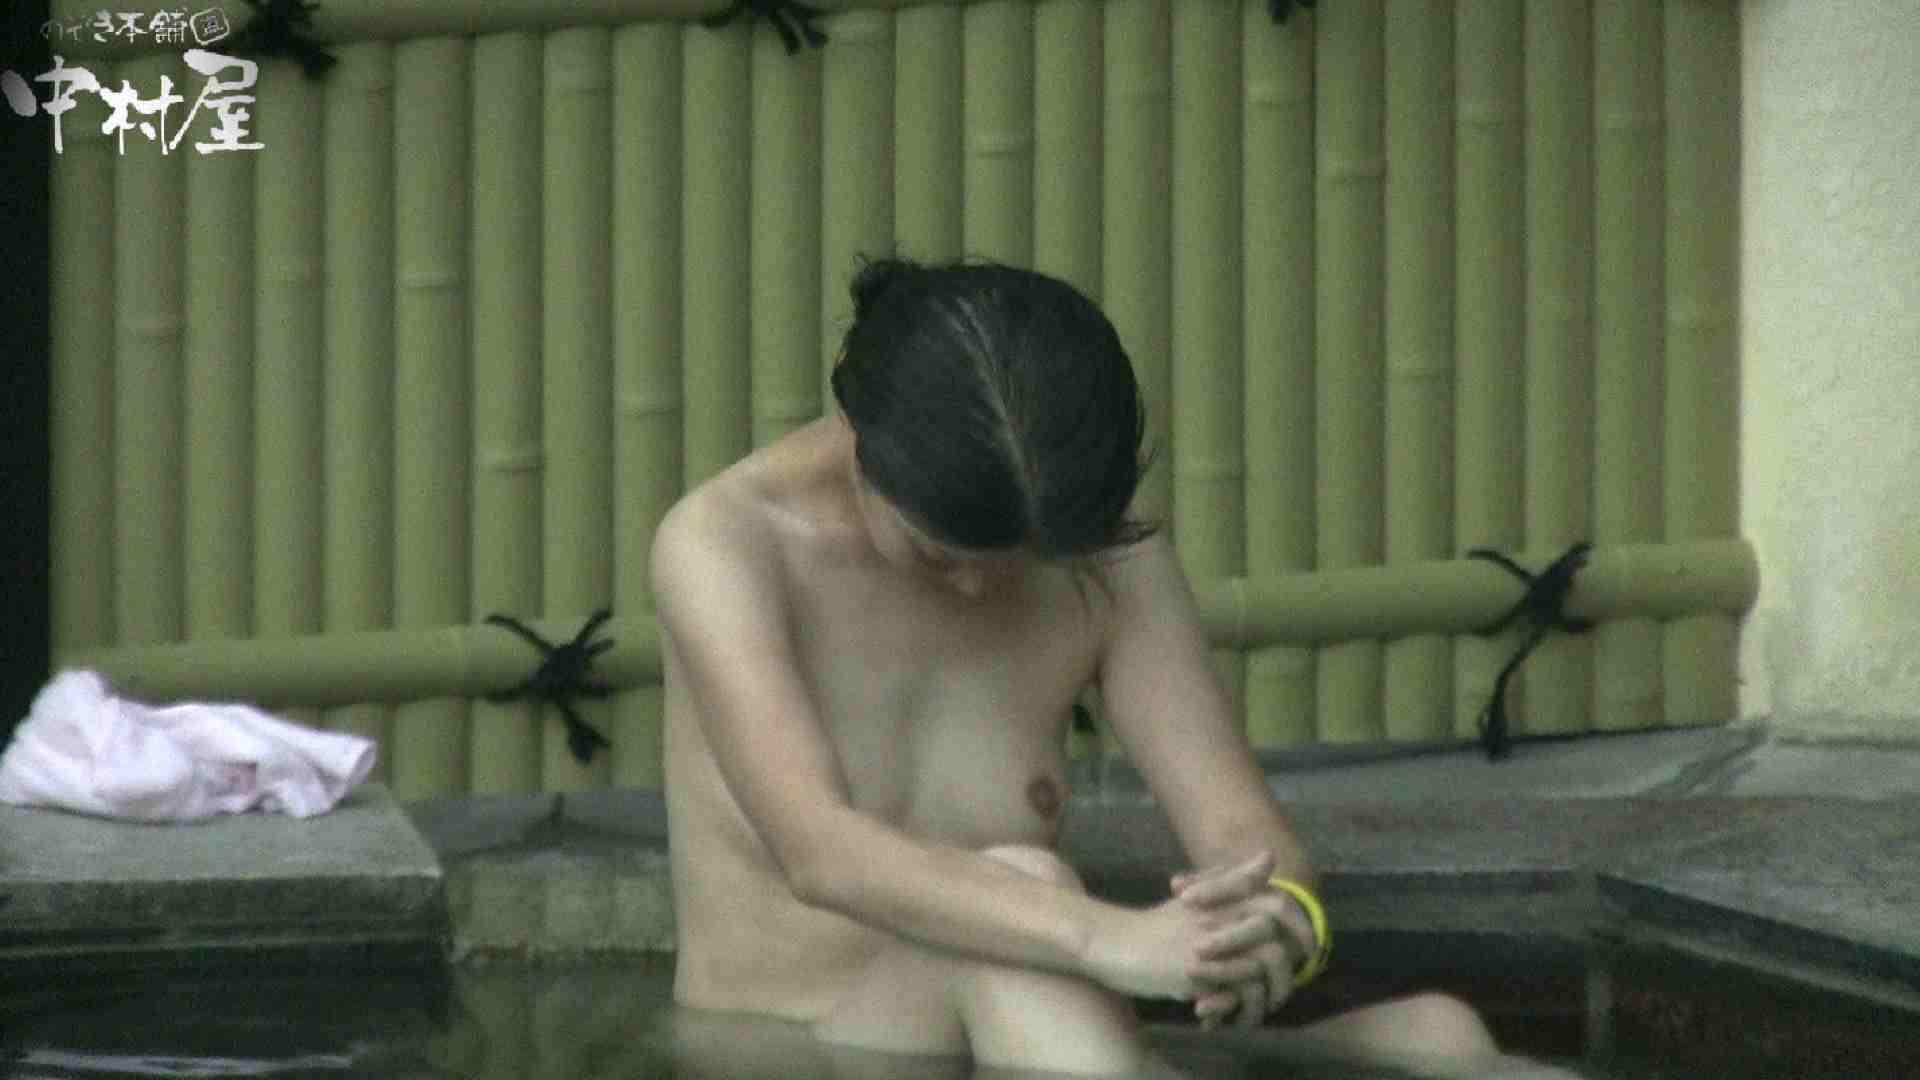 Aquaな露天風呂Vol.904 OL  60連発 49